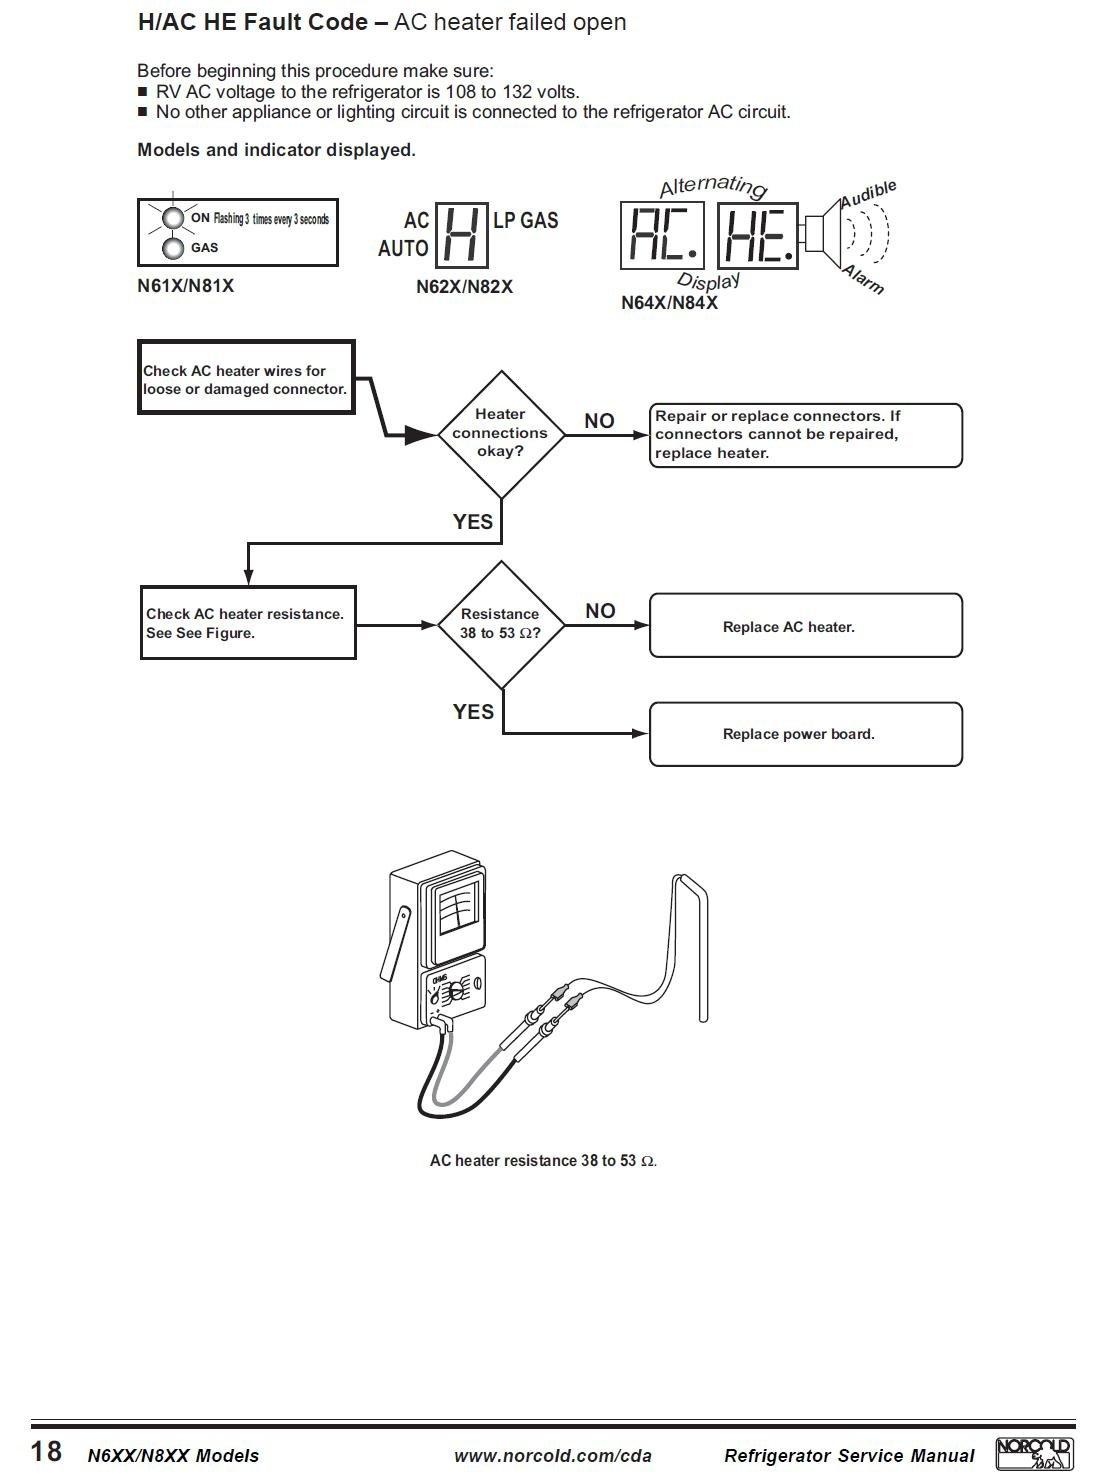 Motorhome Refrigerator Indicator Light Wiring Diagram Library Camper